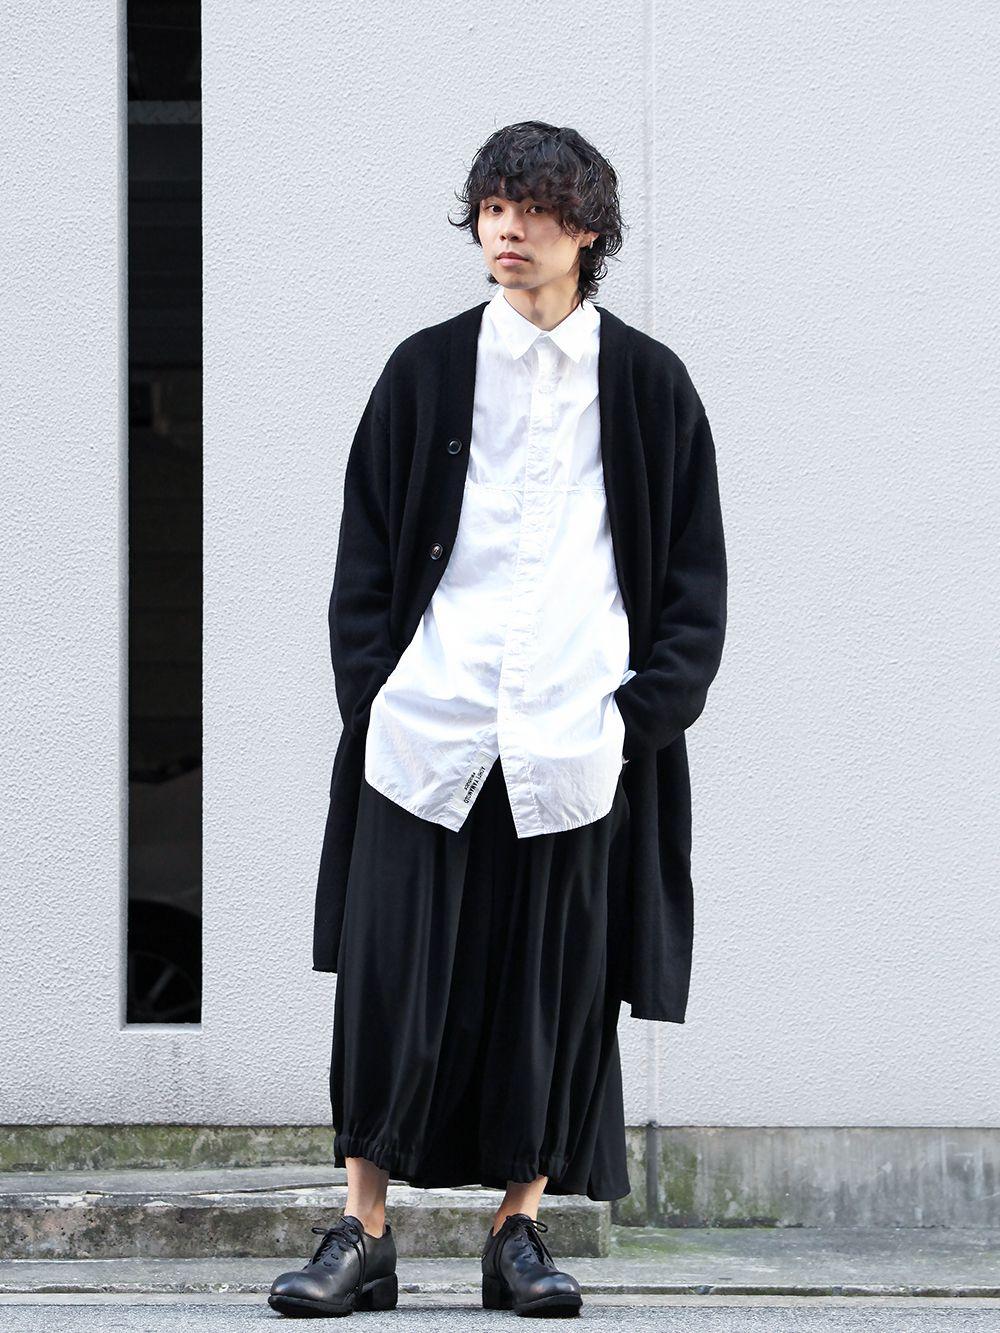 Yohji Yamamoto 19-20AW collection New Arrivals!! - 2-001